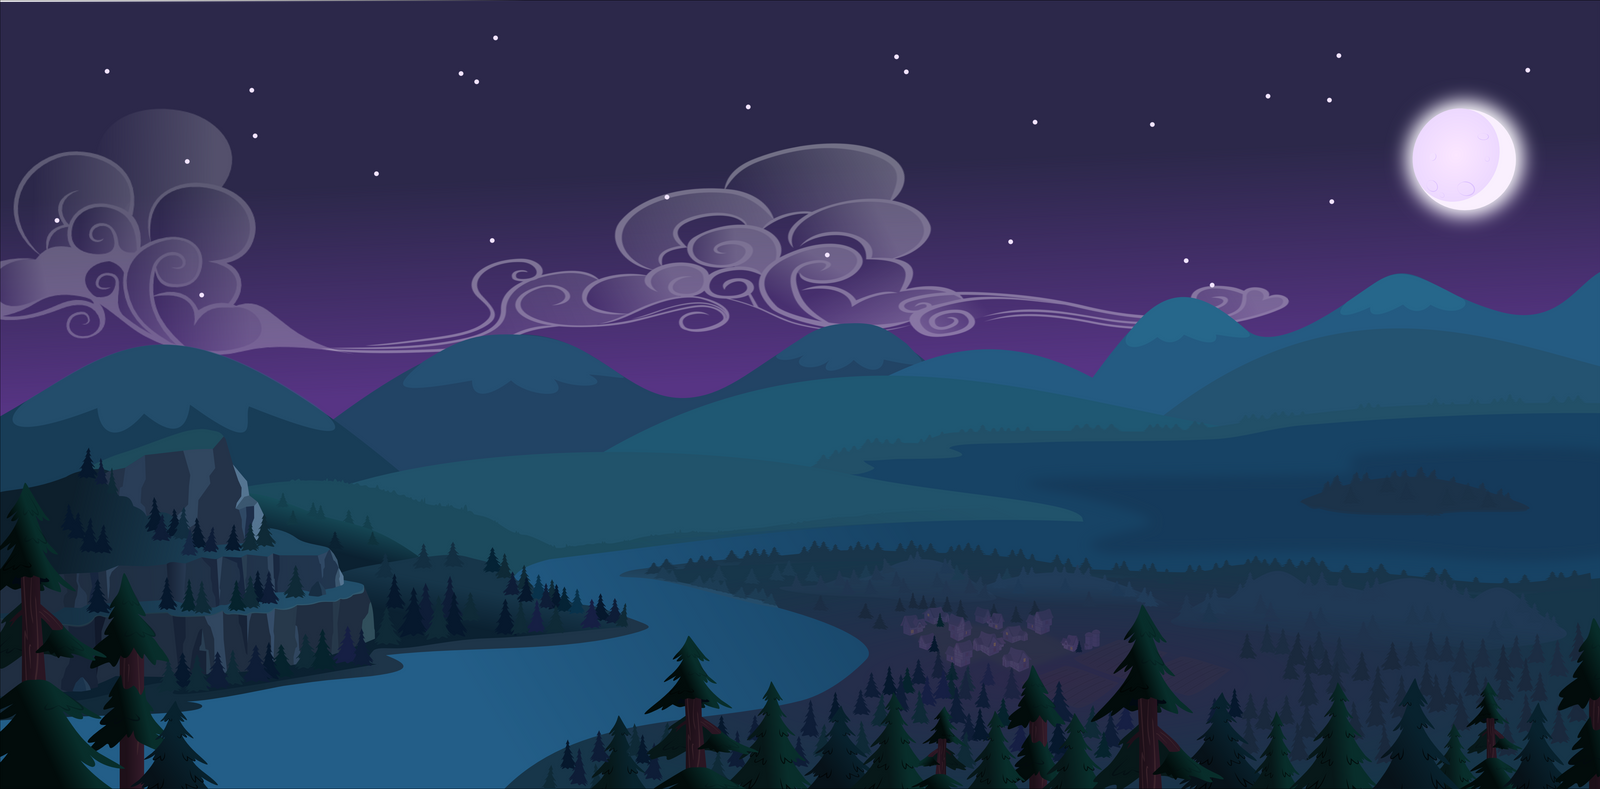 Sky+mountain+night Scene